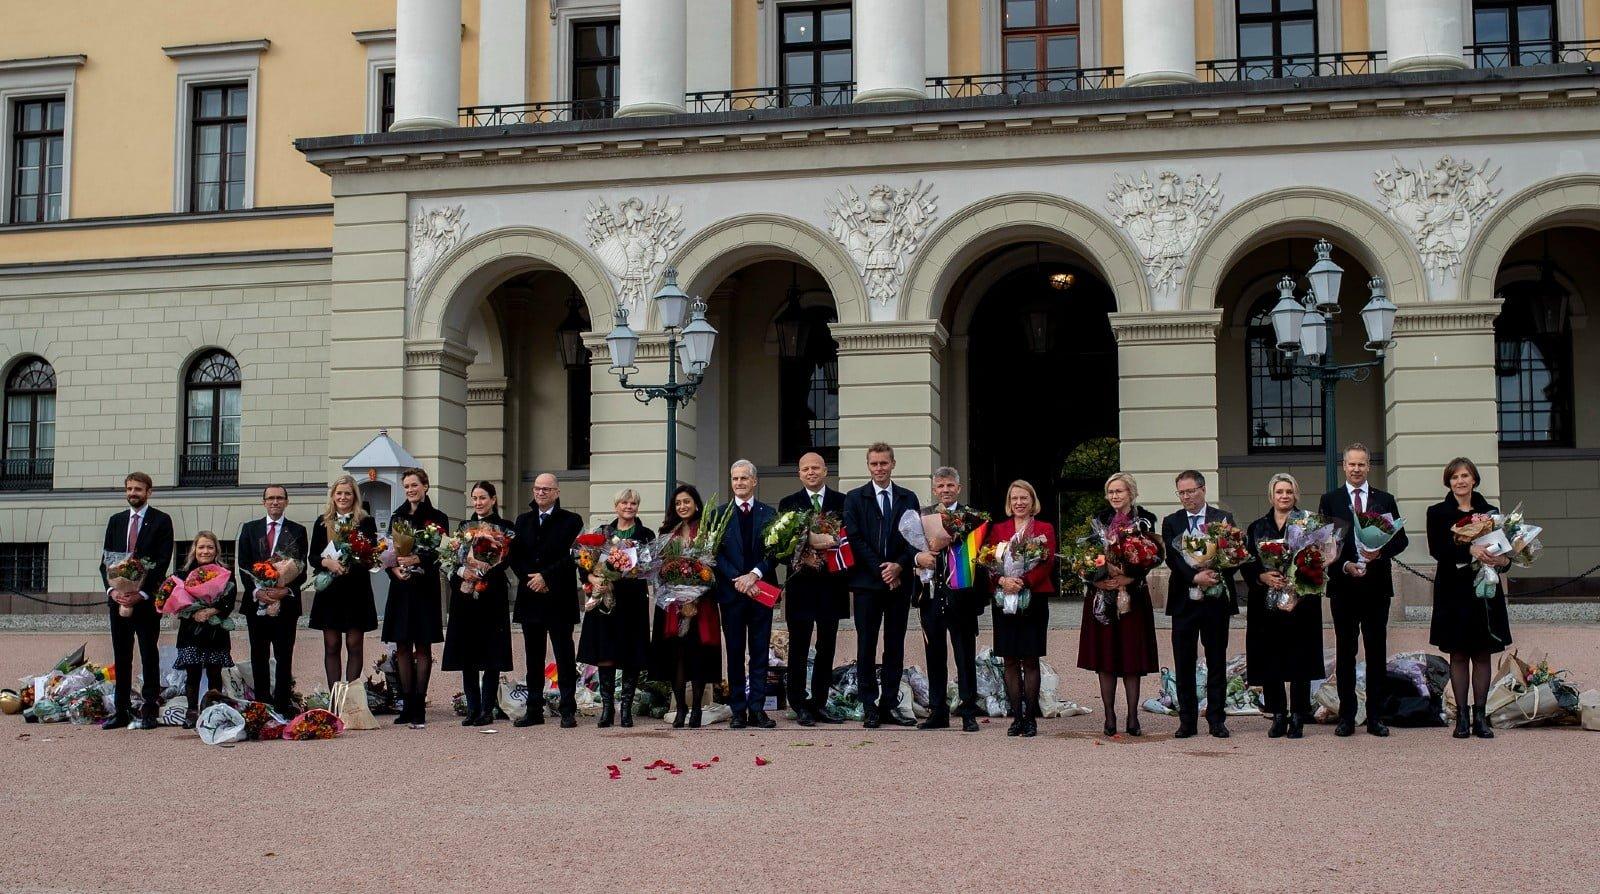 Jonas Gahr Støre and his new government at Slottsplassen.